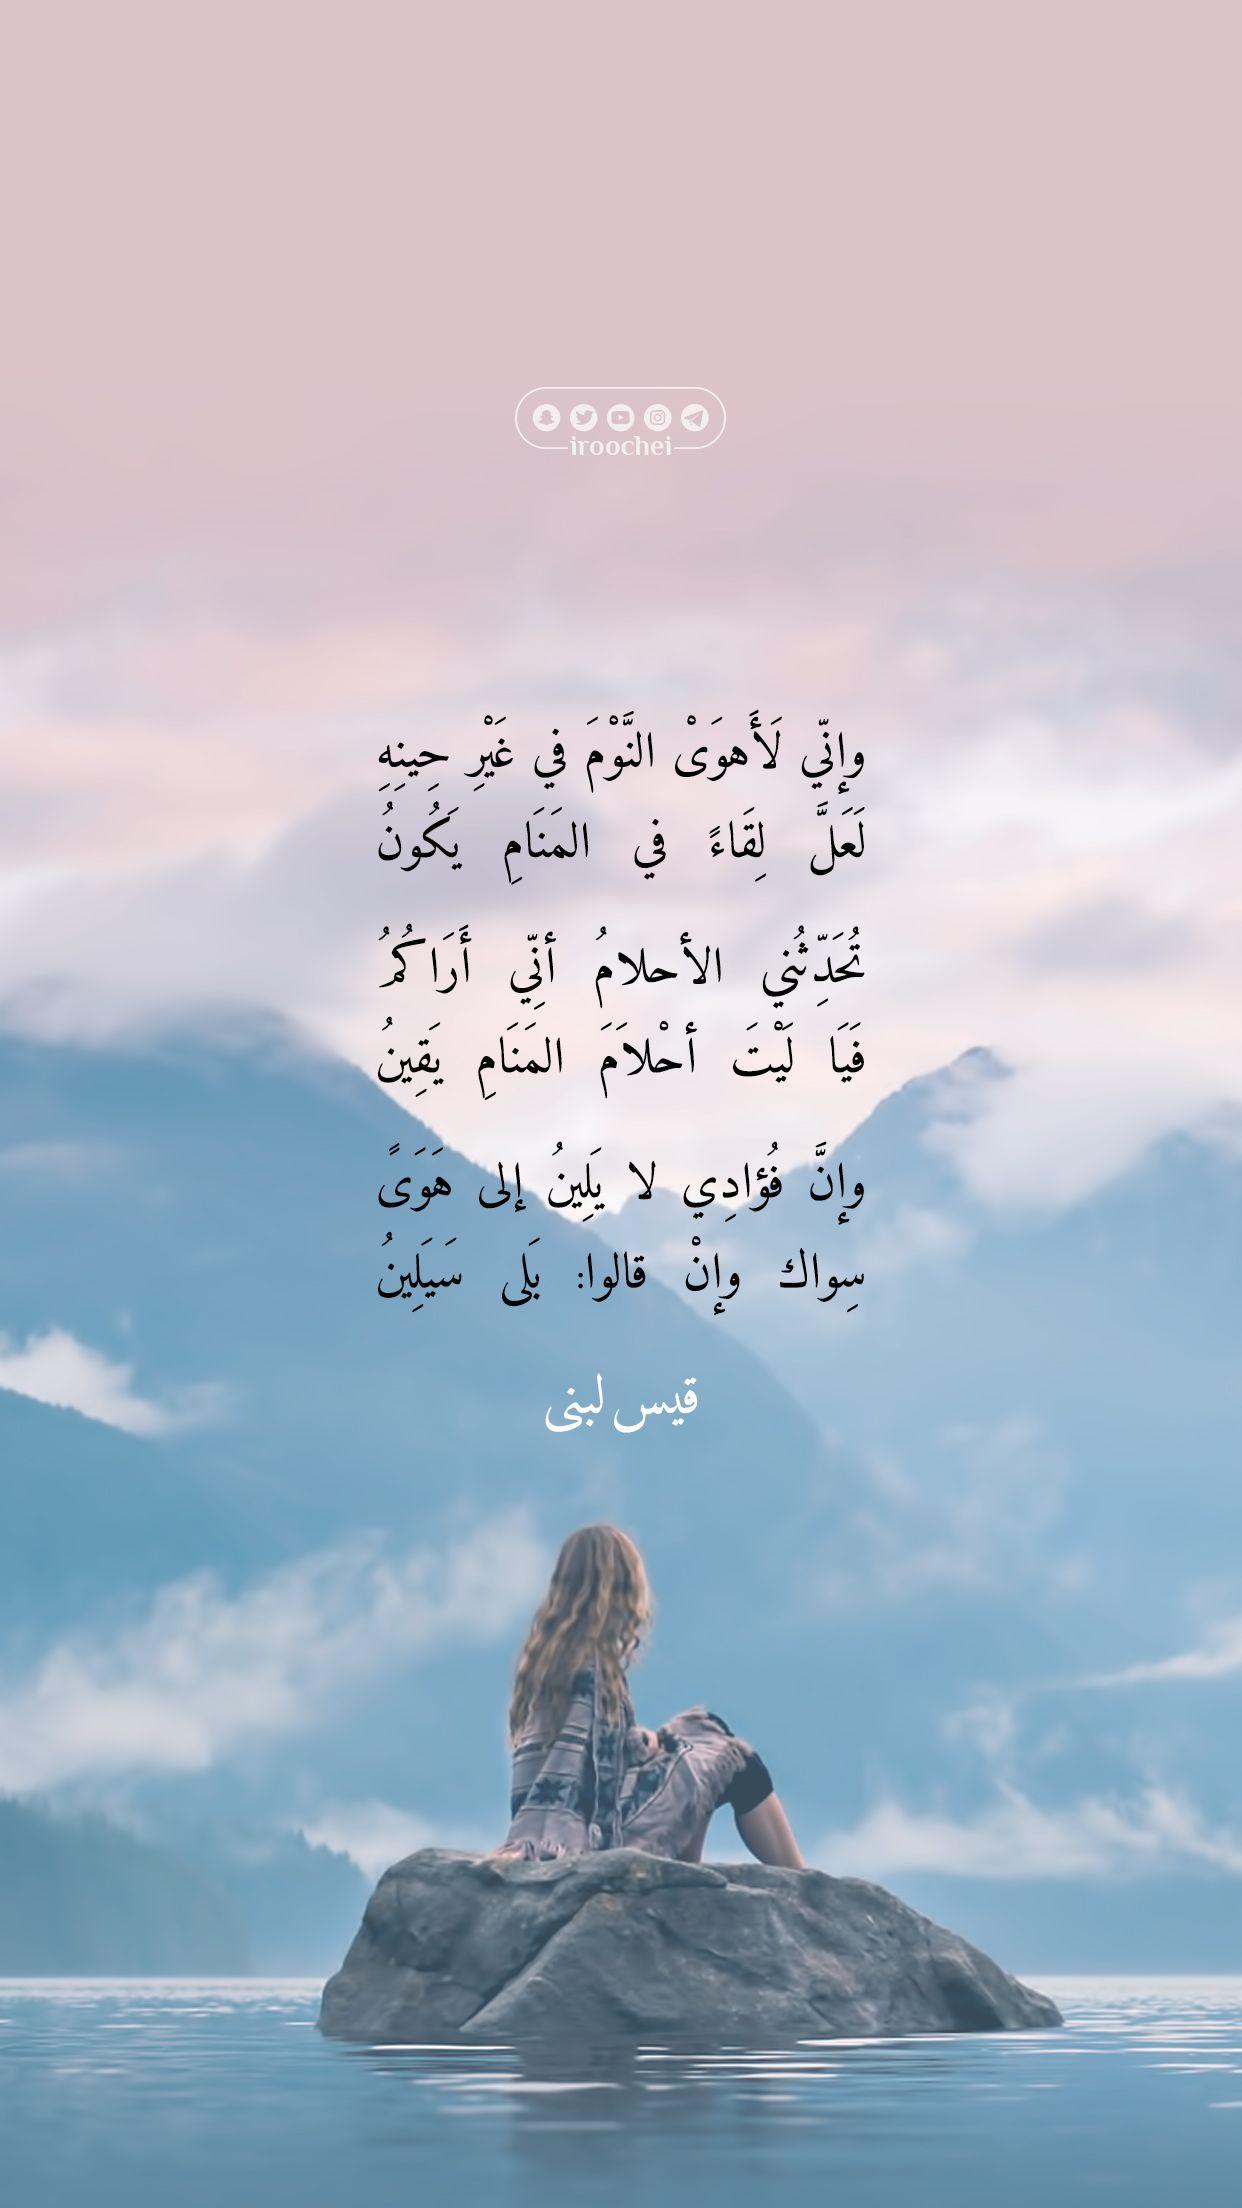 وإني لأهوى النوم في غير حينه Quran Quotes Love Favorite Book Quotes Beautiful Arabic Words